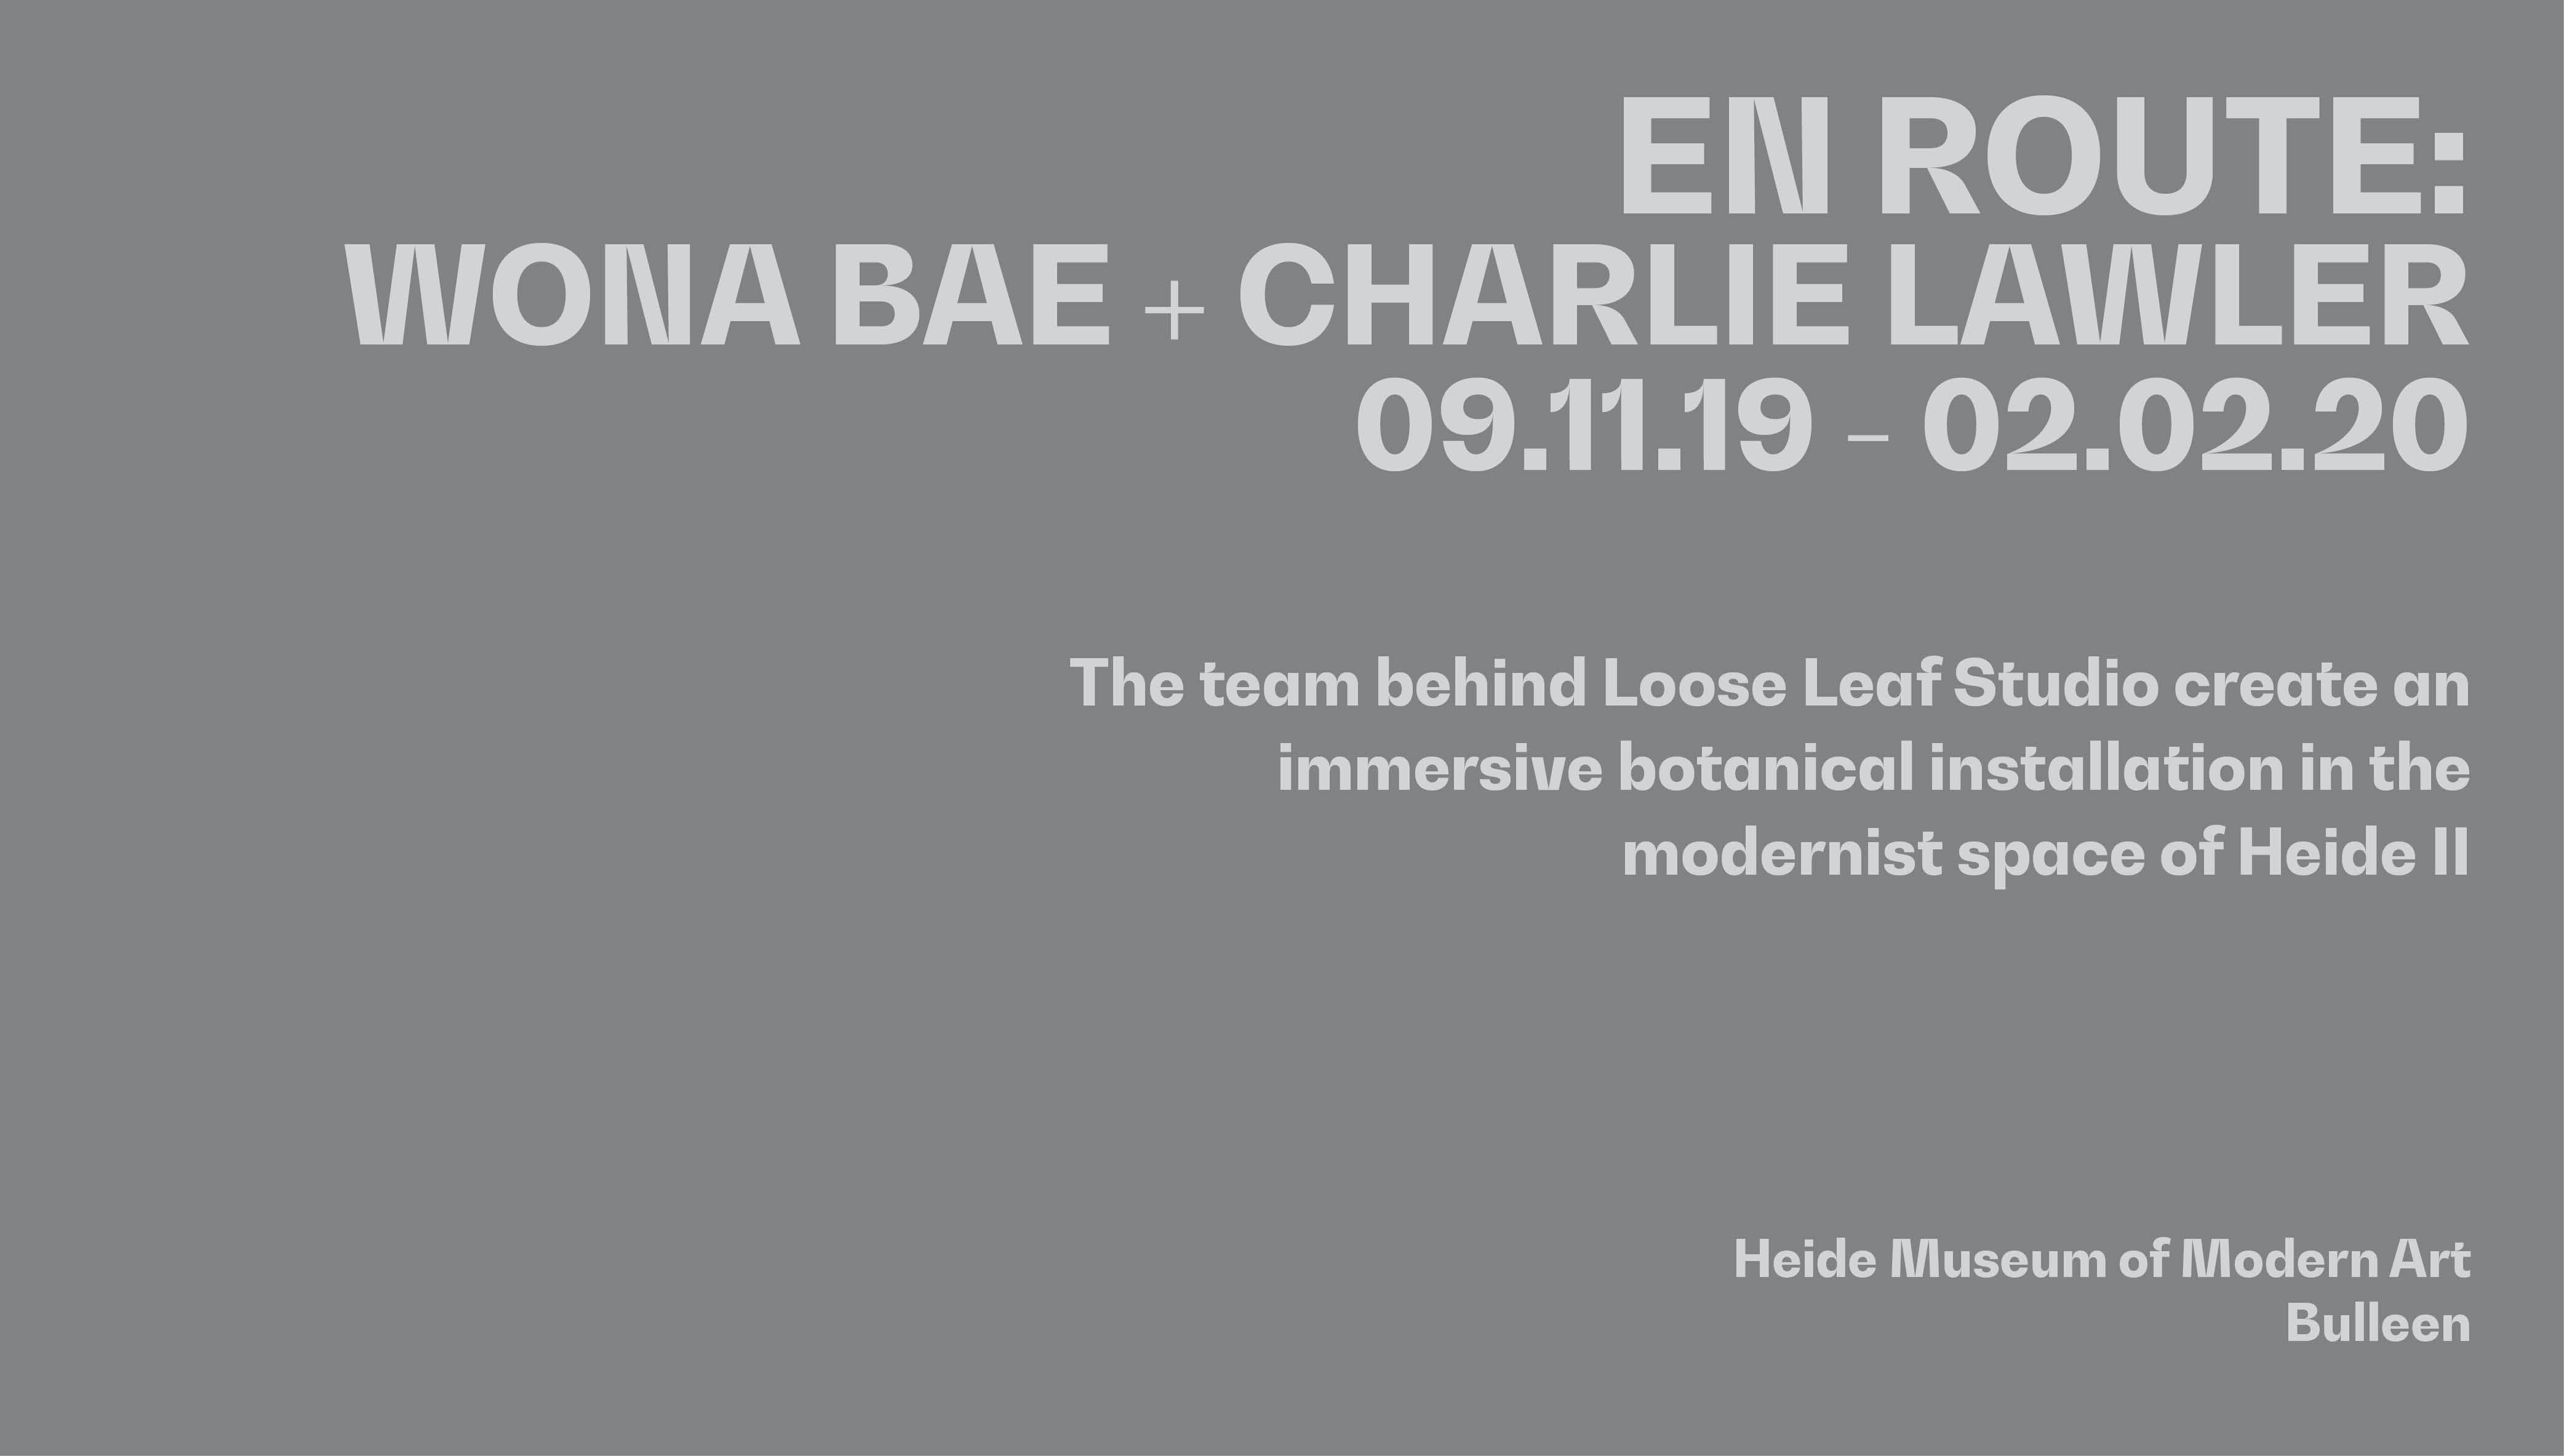 'EN ROUTE' at Heide MoMA